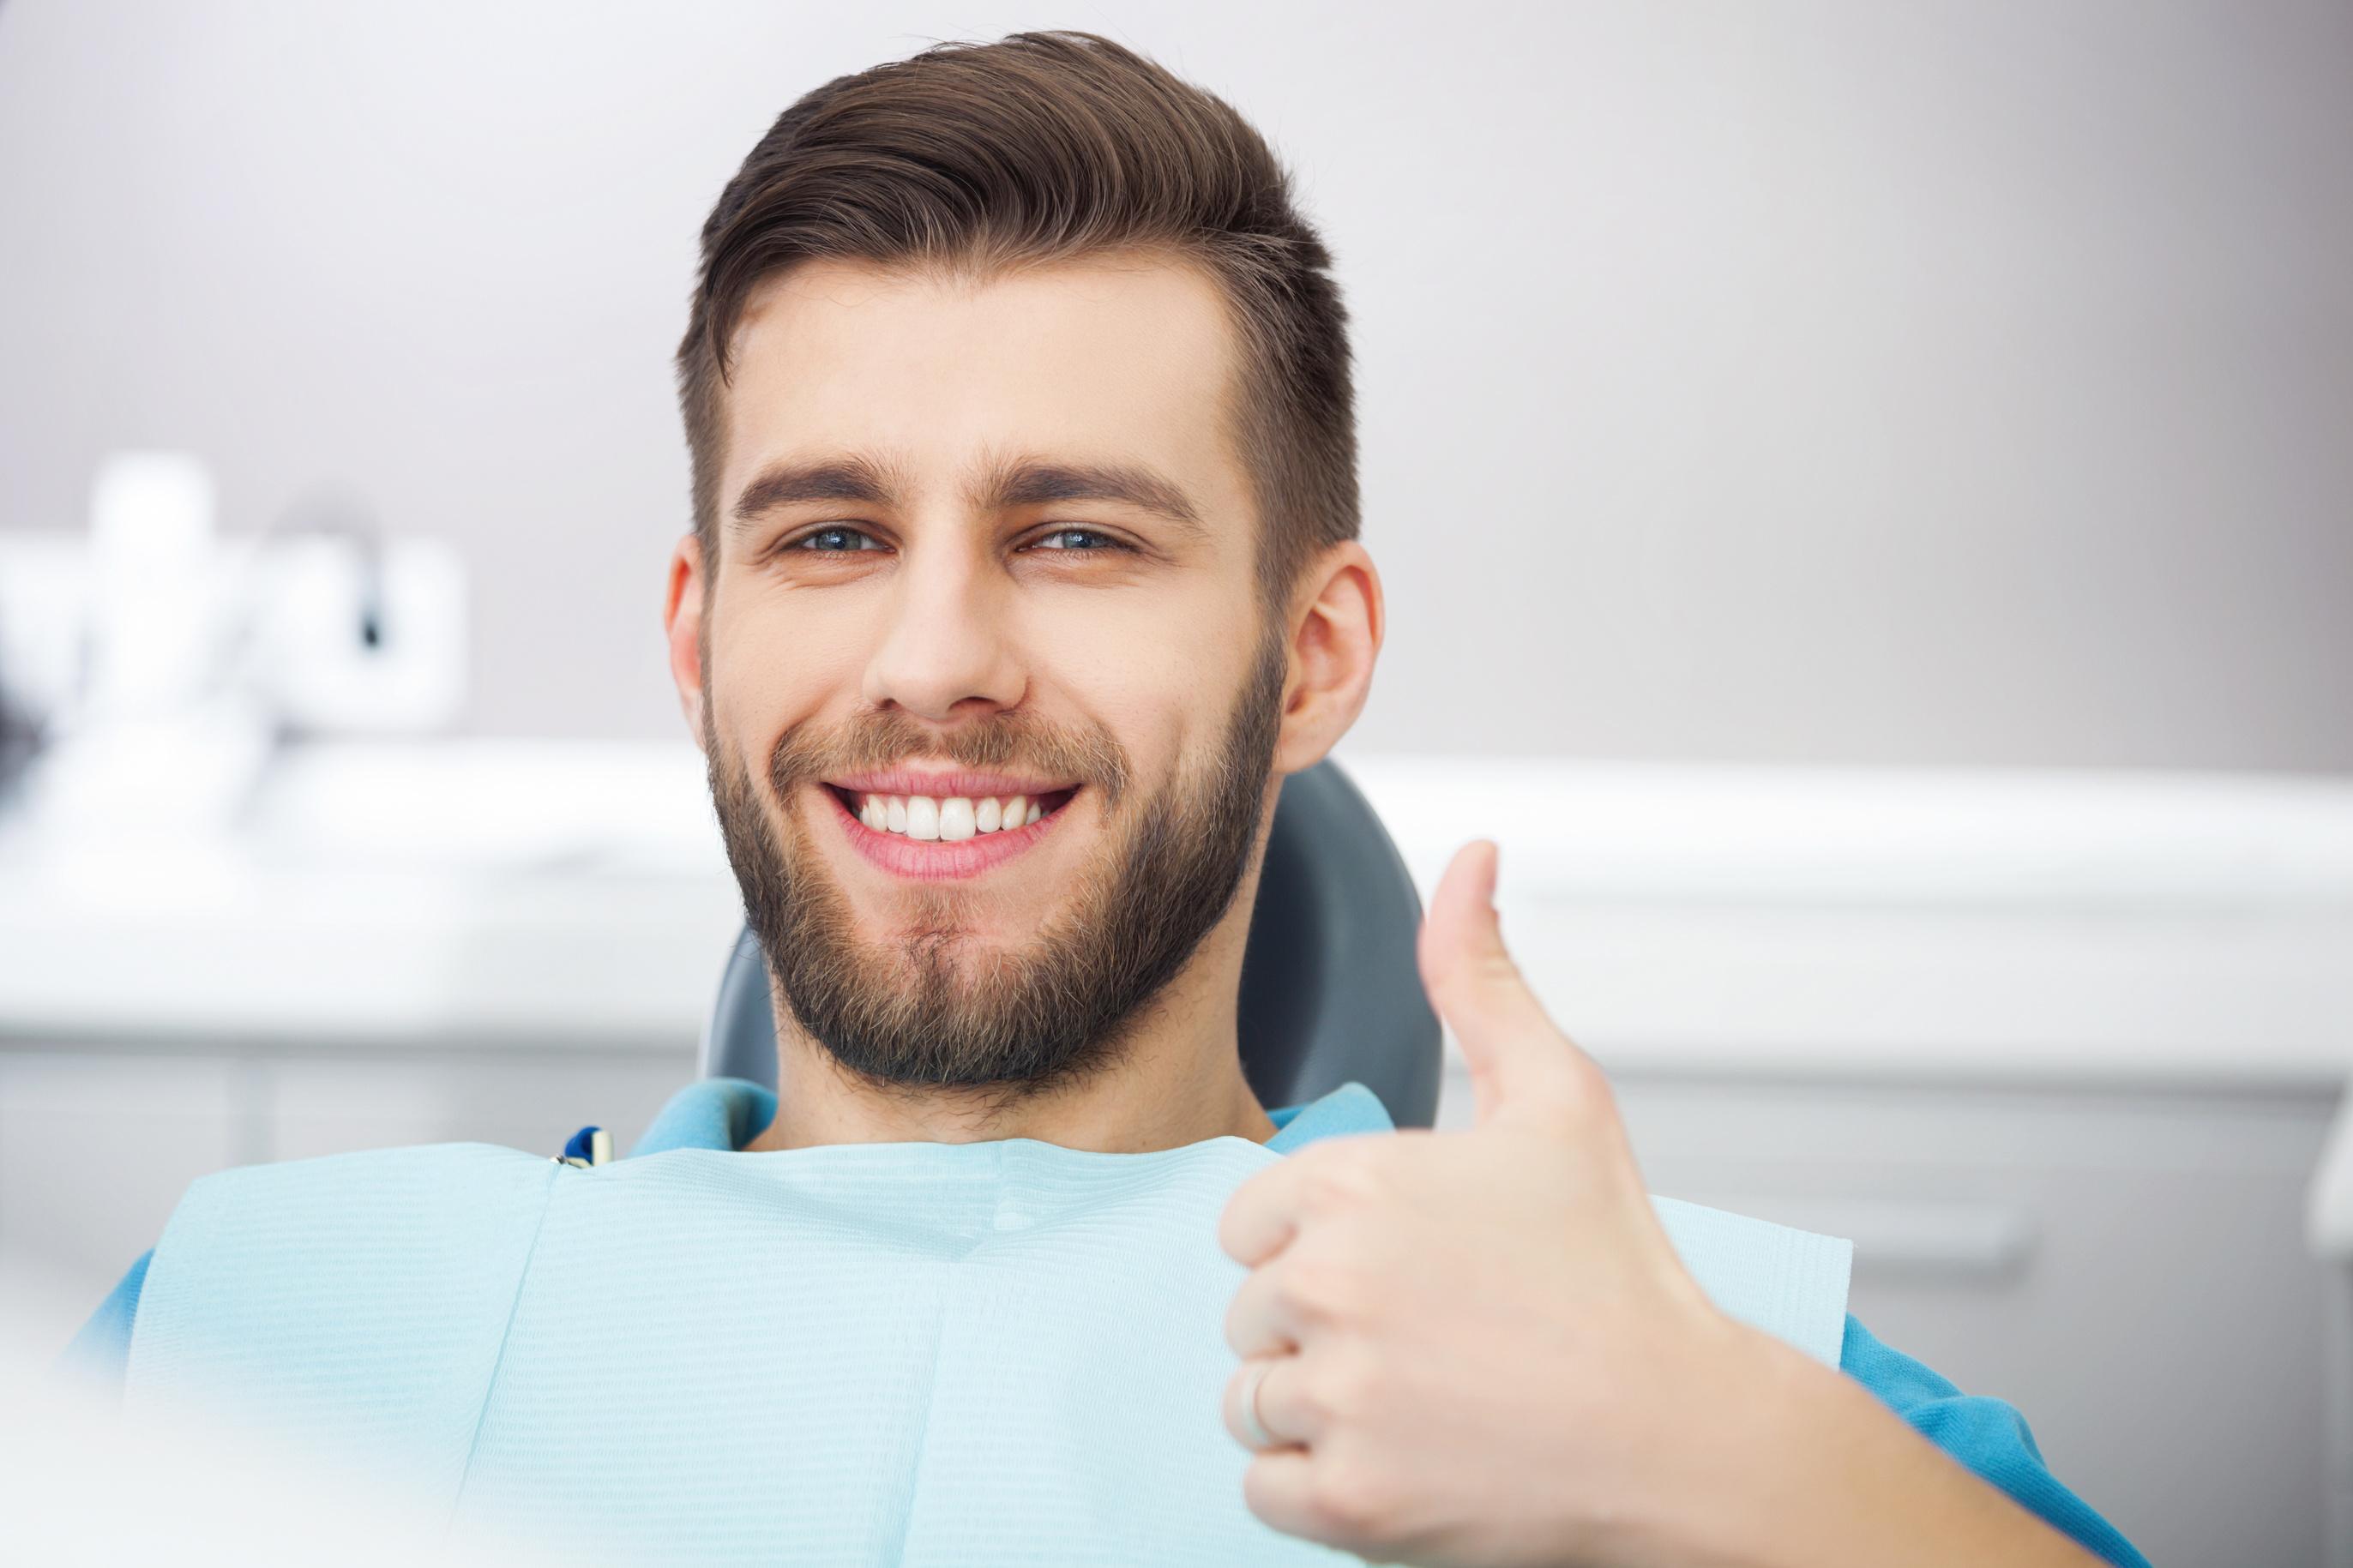 Where can I find an Alpharetta dental office?